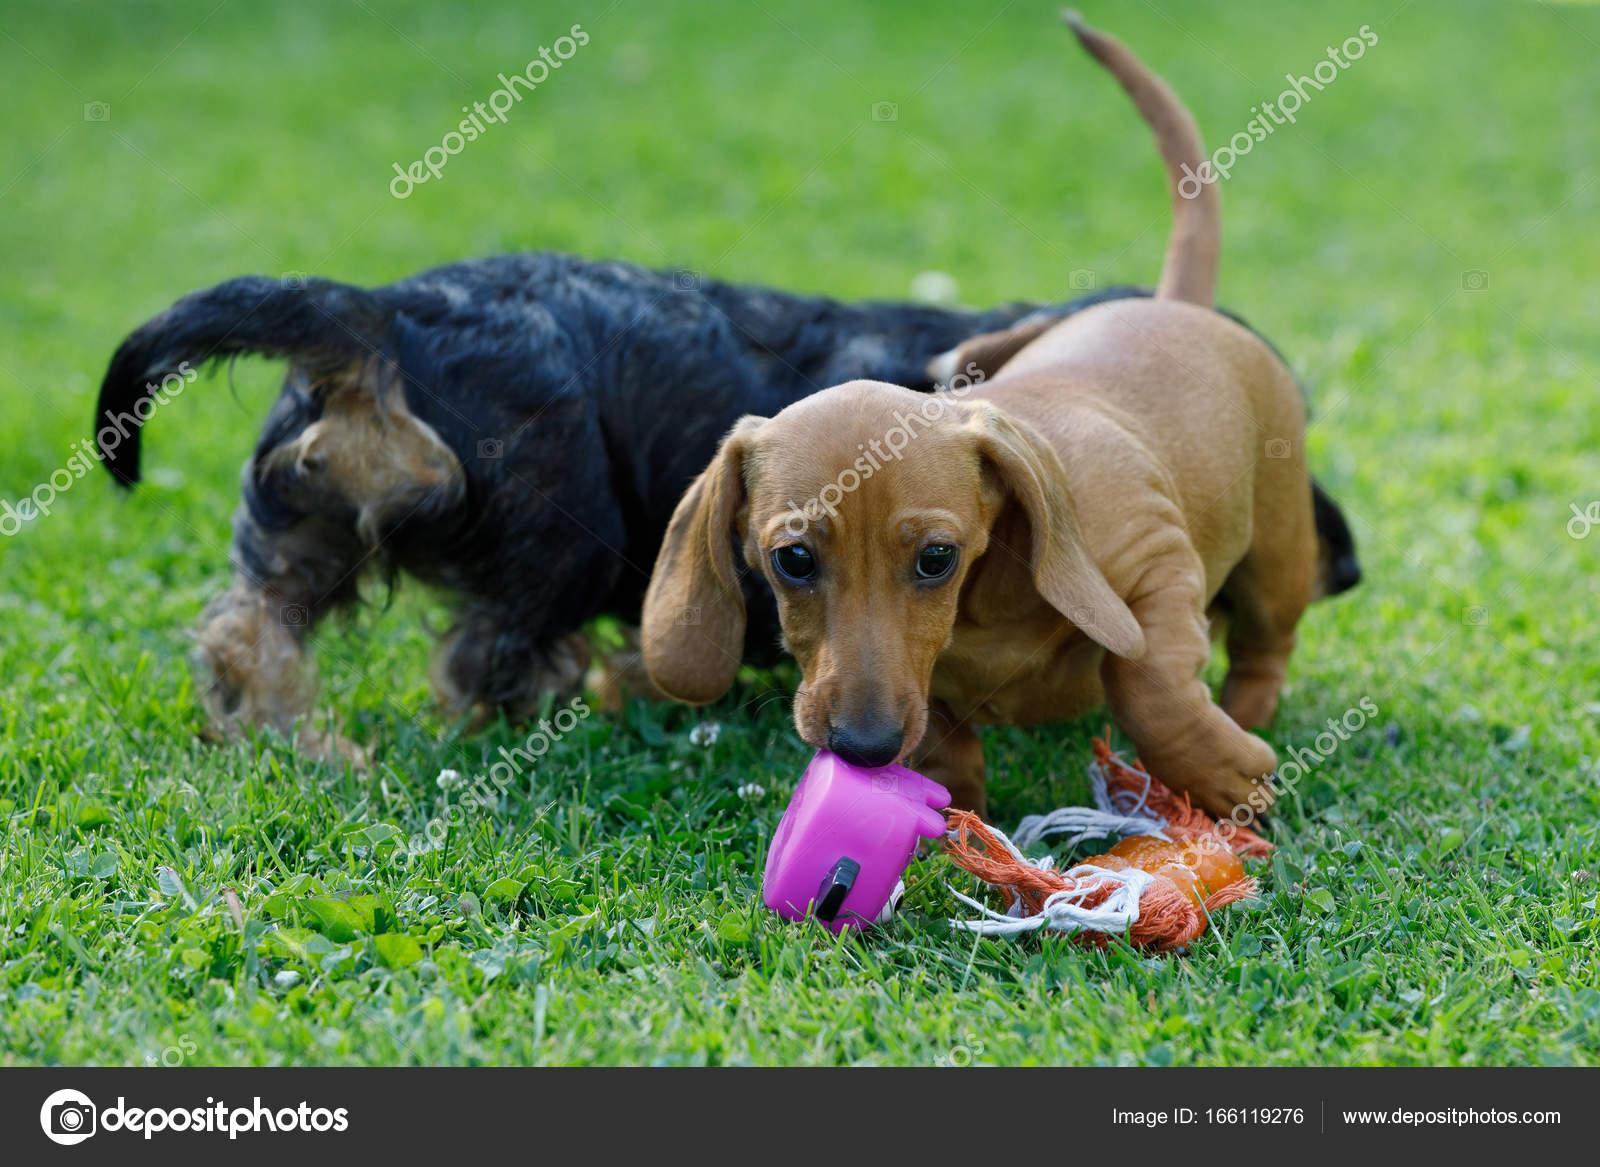 Fotos Perritos Salchicha Chiquitos Juega Dachshund Perros